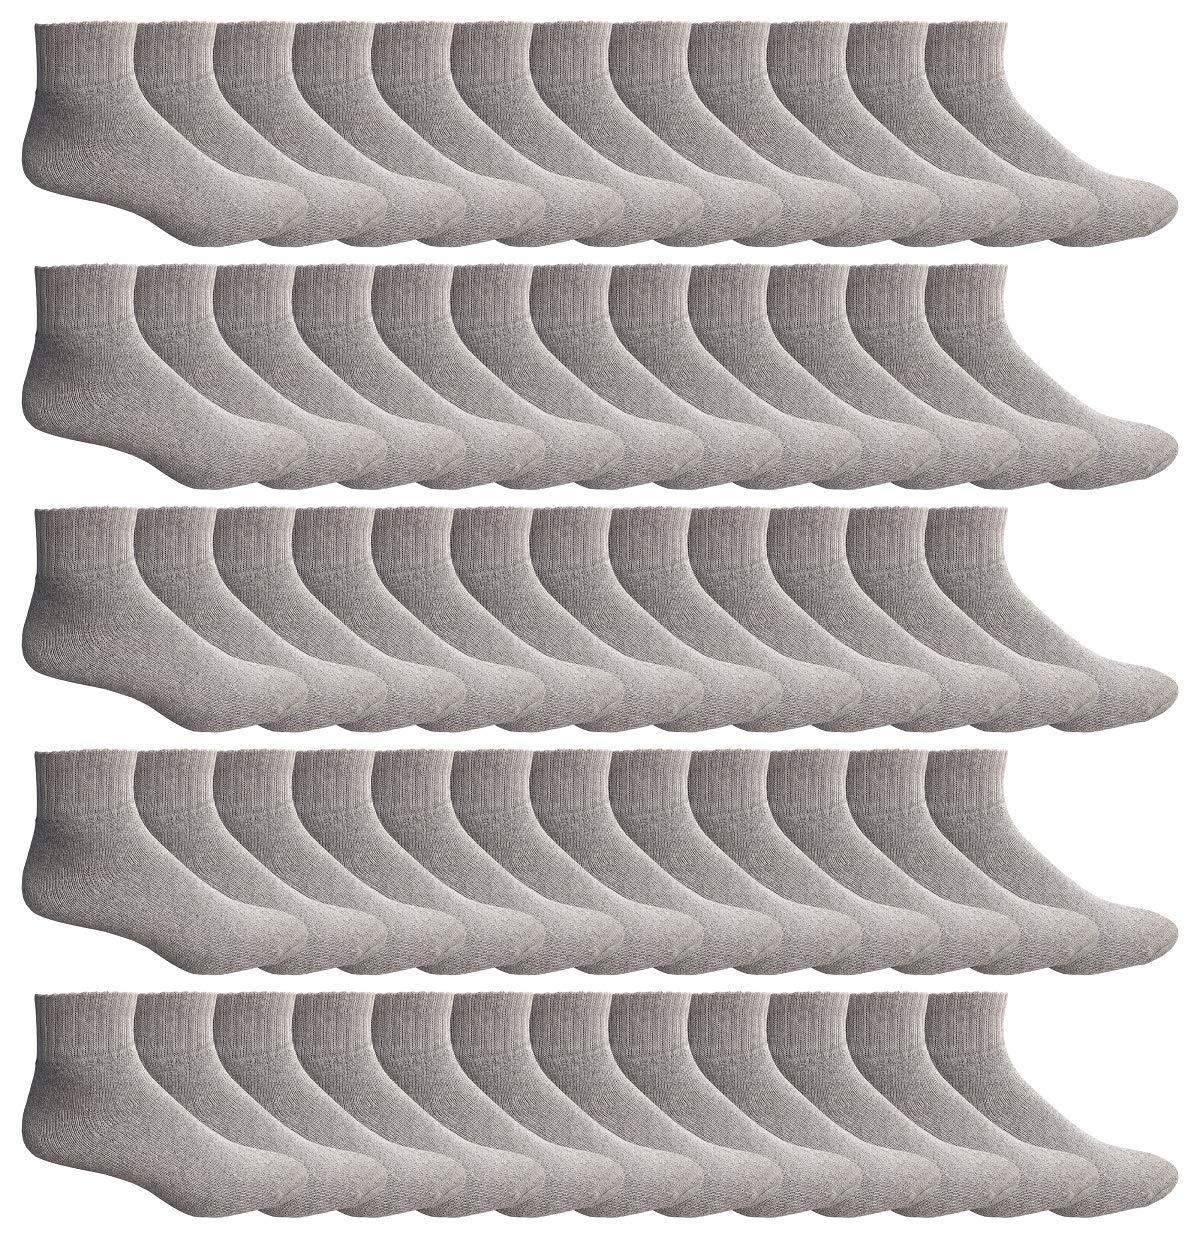 WSD Mens Ankle Socks, Wholesale Bulk Pack Athletic Sports Sock (180 Pairs Gray)